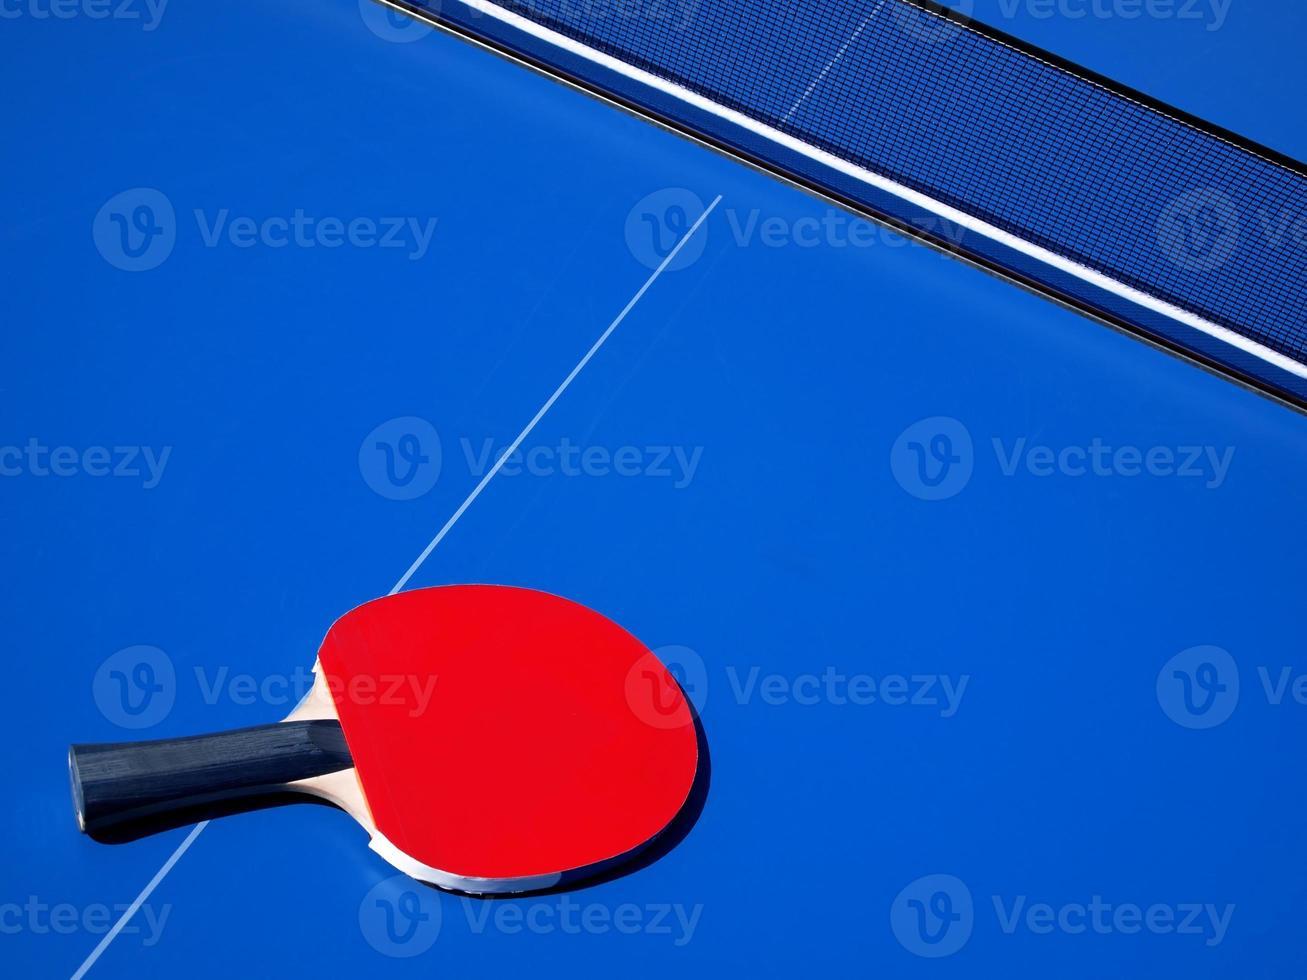 blå tennisbord och röd ping pong bat foto